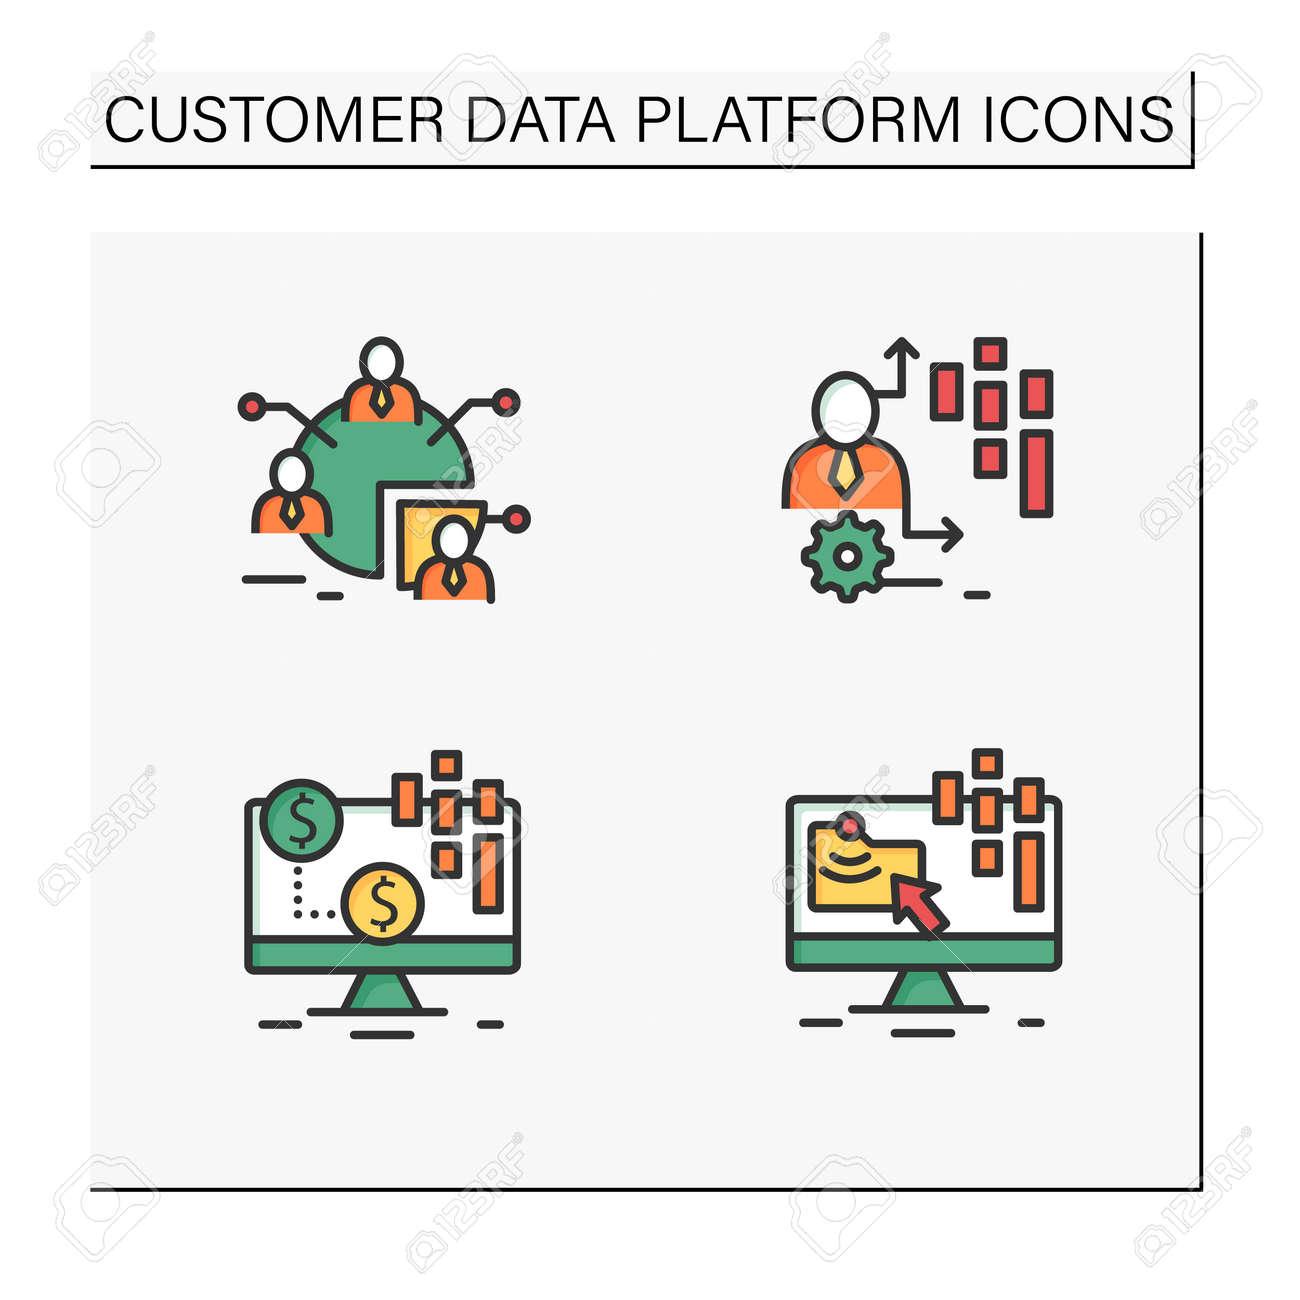 Customer data platform color icons set - 166804549